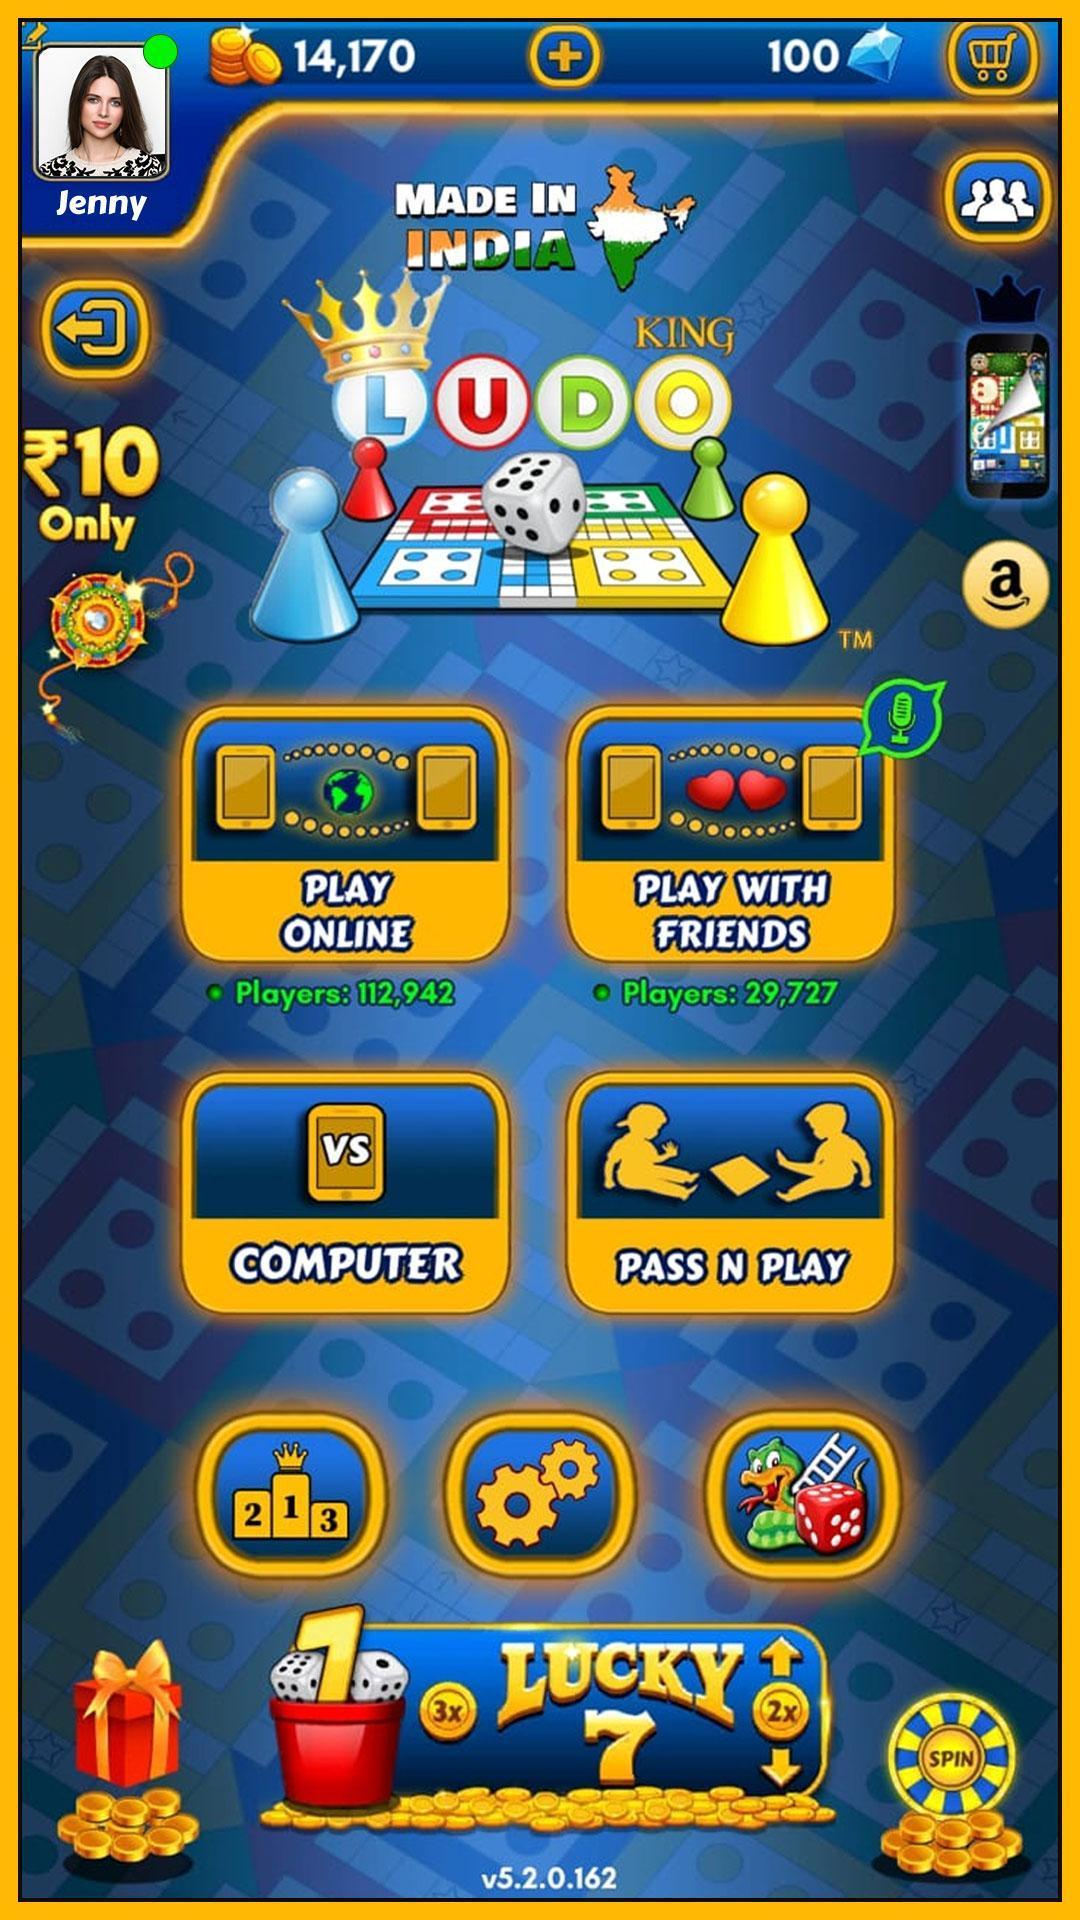 Ludo King™ 5.2.0.163 Screenshot 3